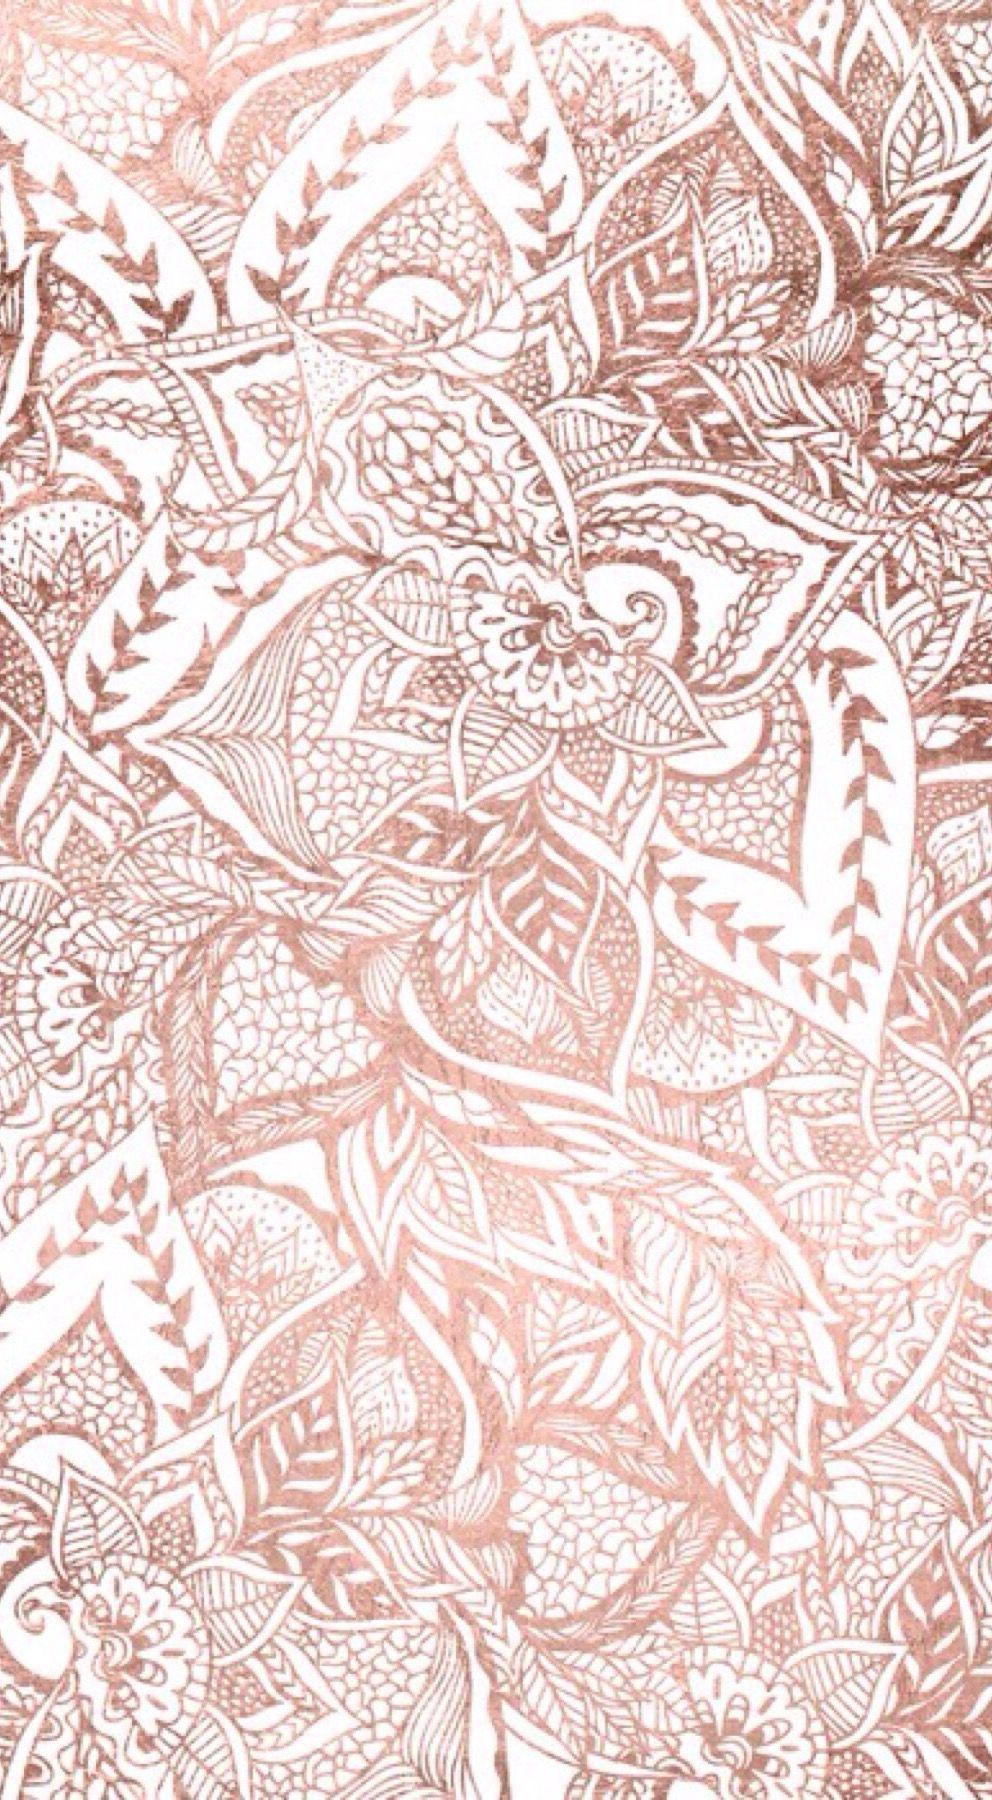 Rose Gold Aesthetic Wallpaper Iphone : aesthetic, wallpaper, iphone, Aesthetic, Wallpapers, Backgrounds, WallpaperAccess